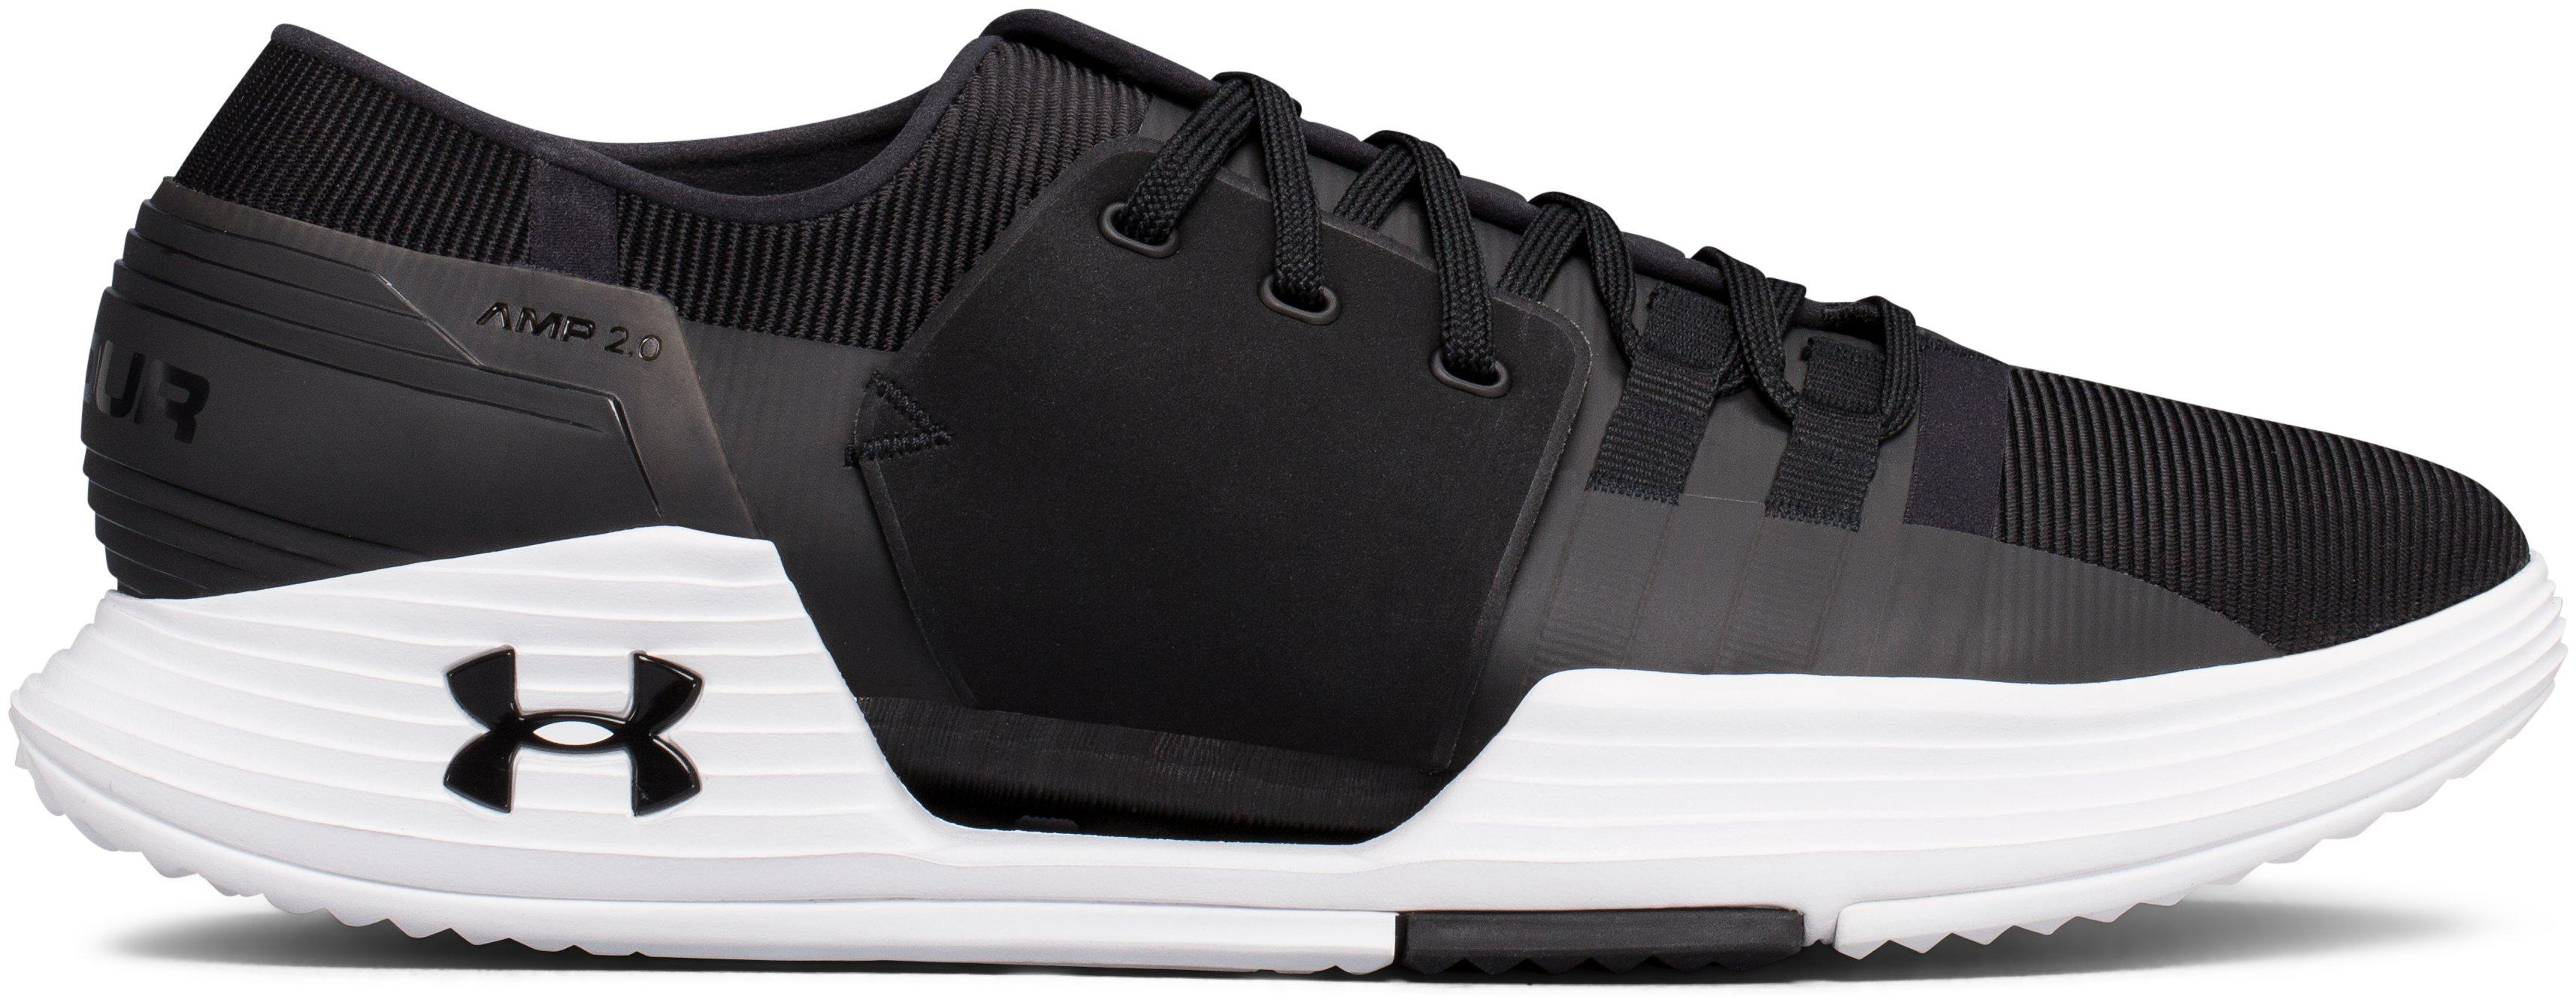 Men's UA SpeedForm® AMP 2.0 Training Shoes, 360 degree view